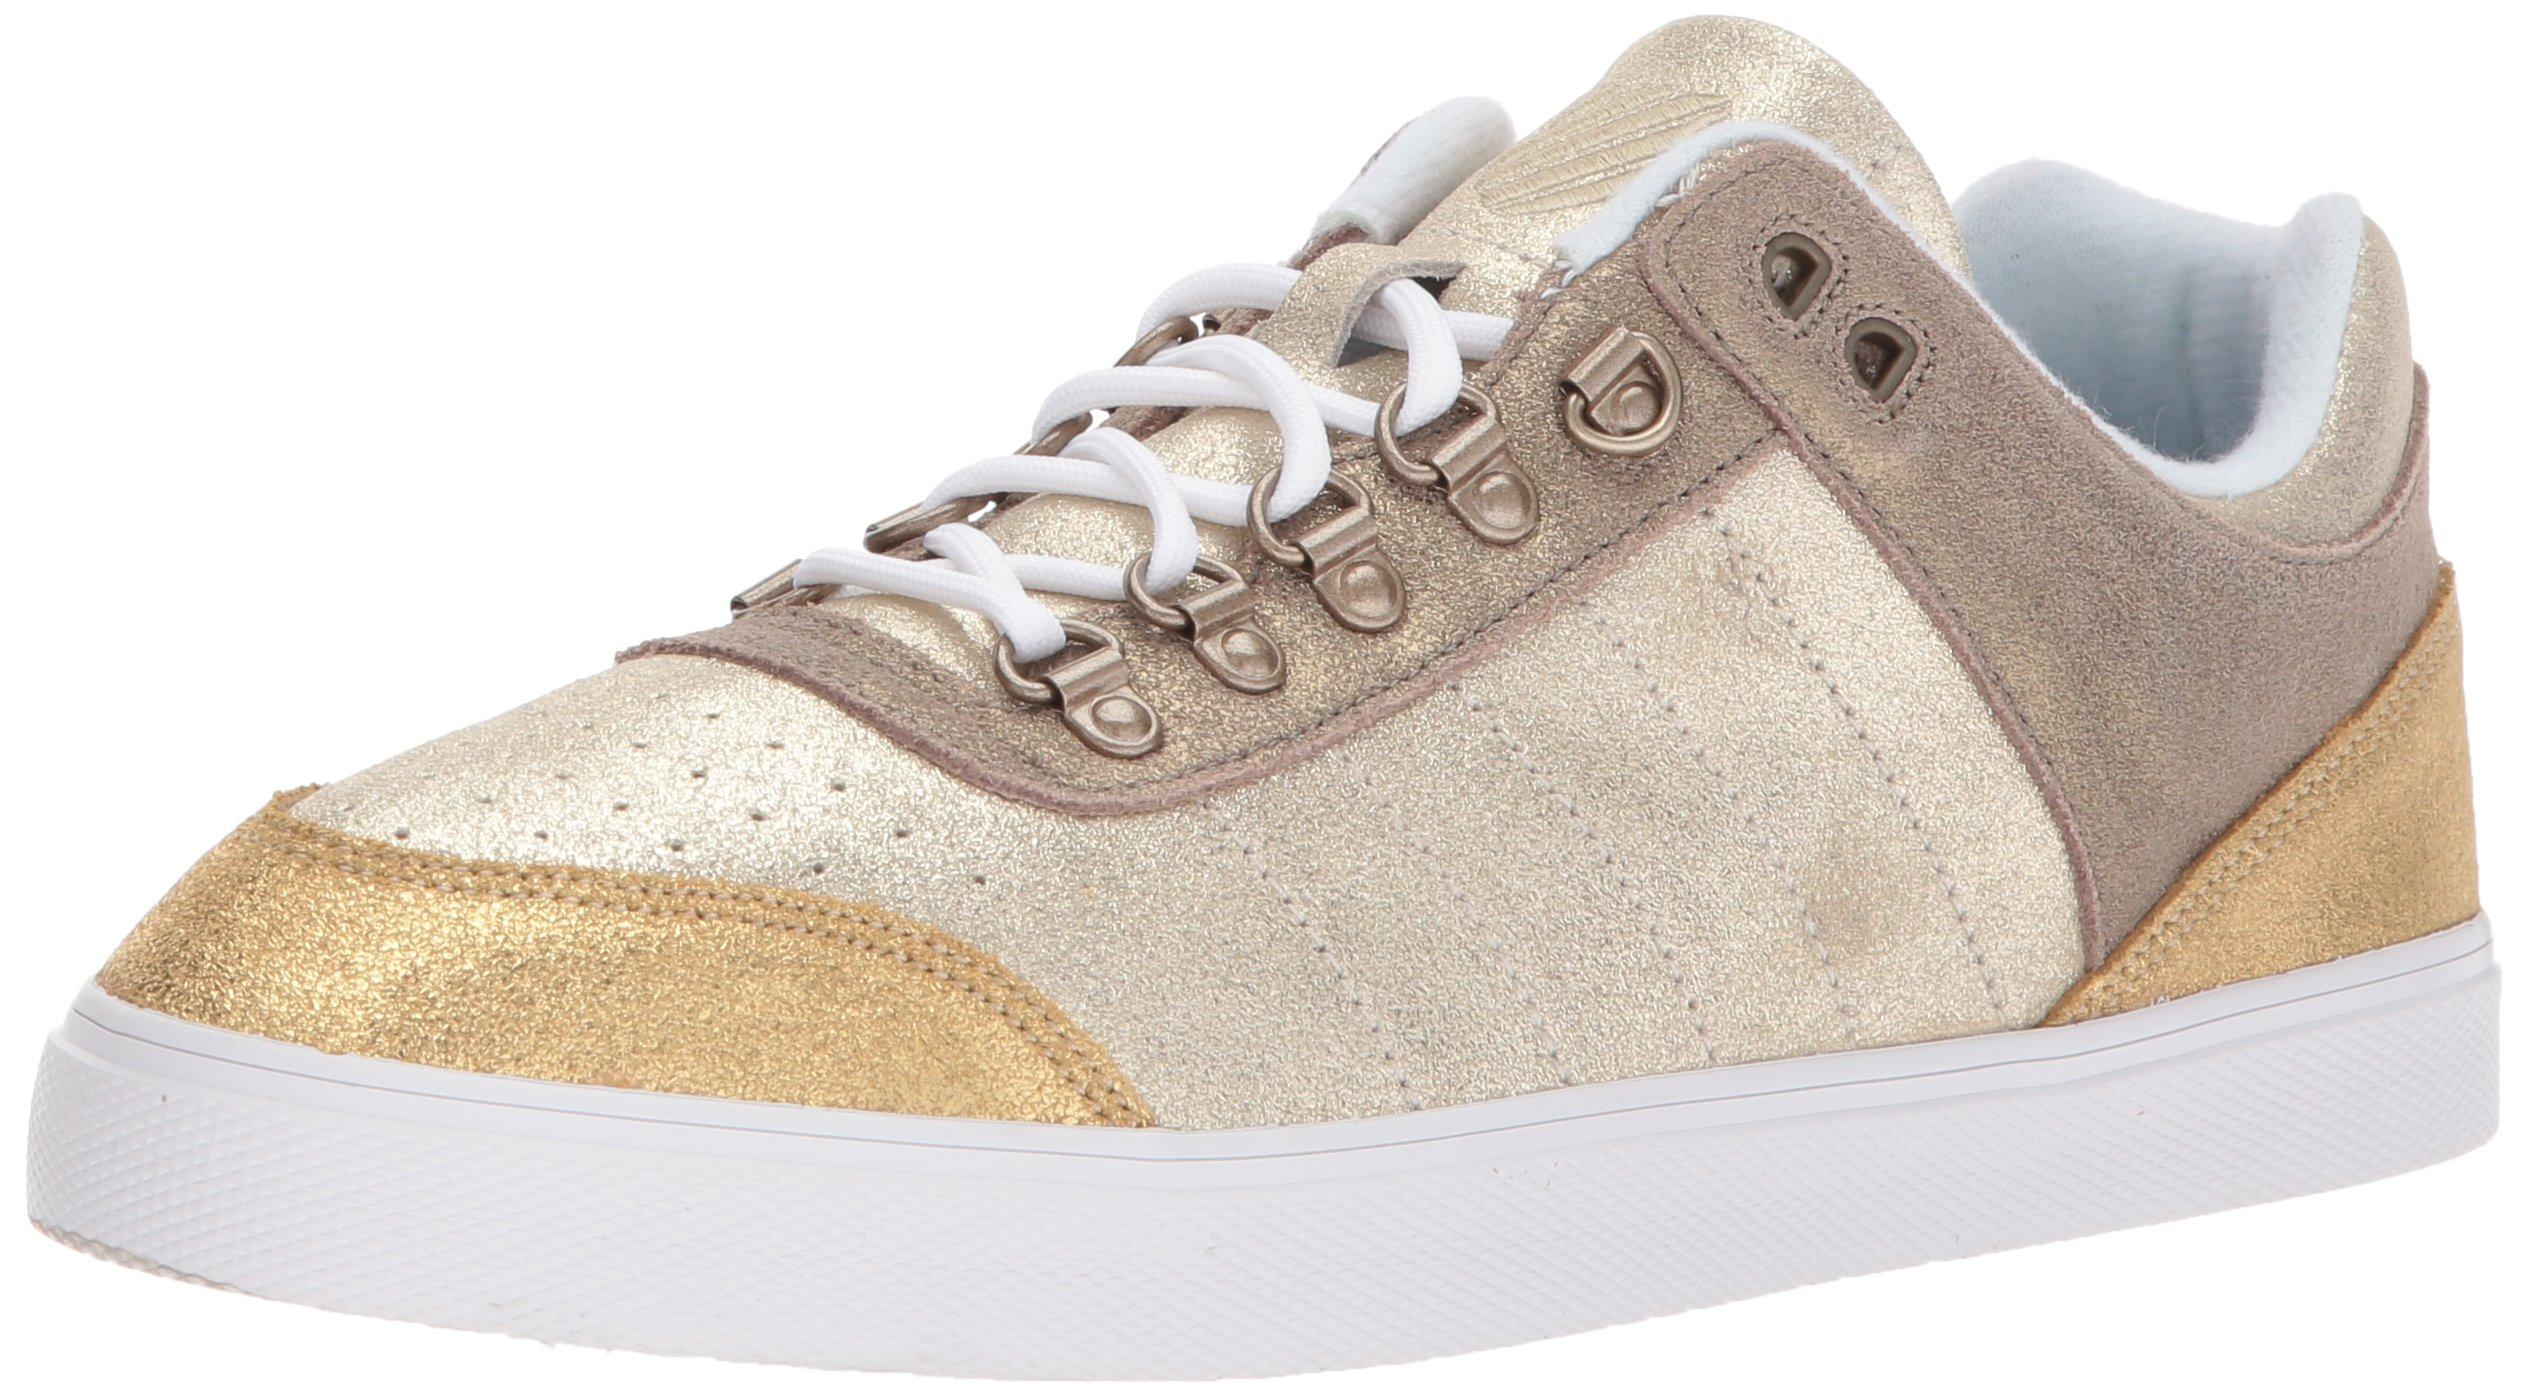 Neu FemmeOrchampagne Basses Gold39 SdeSneakers swiss 5 K Eu Gstaad Sleek J3TFKc1l